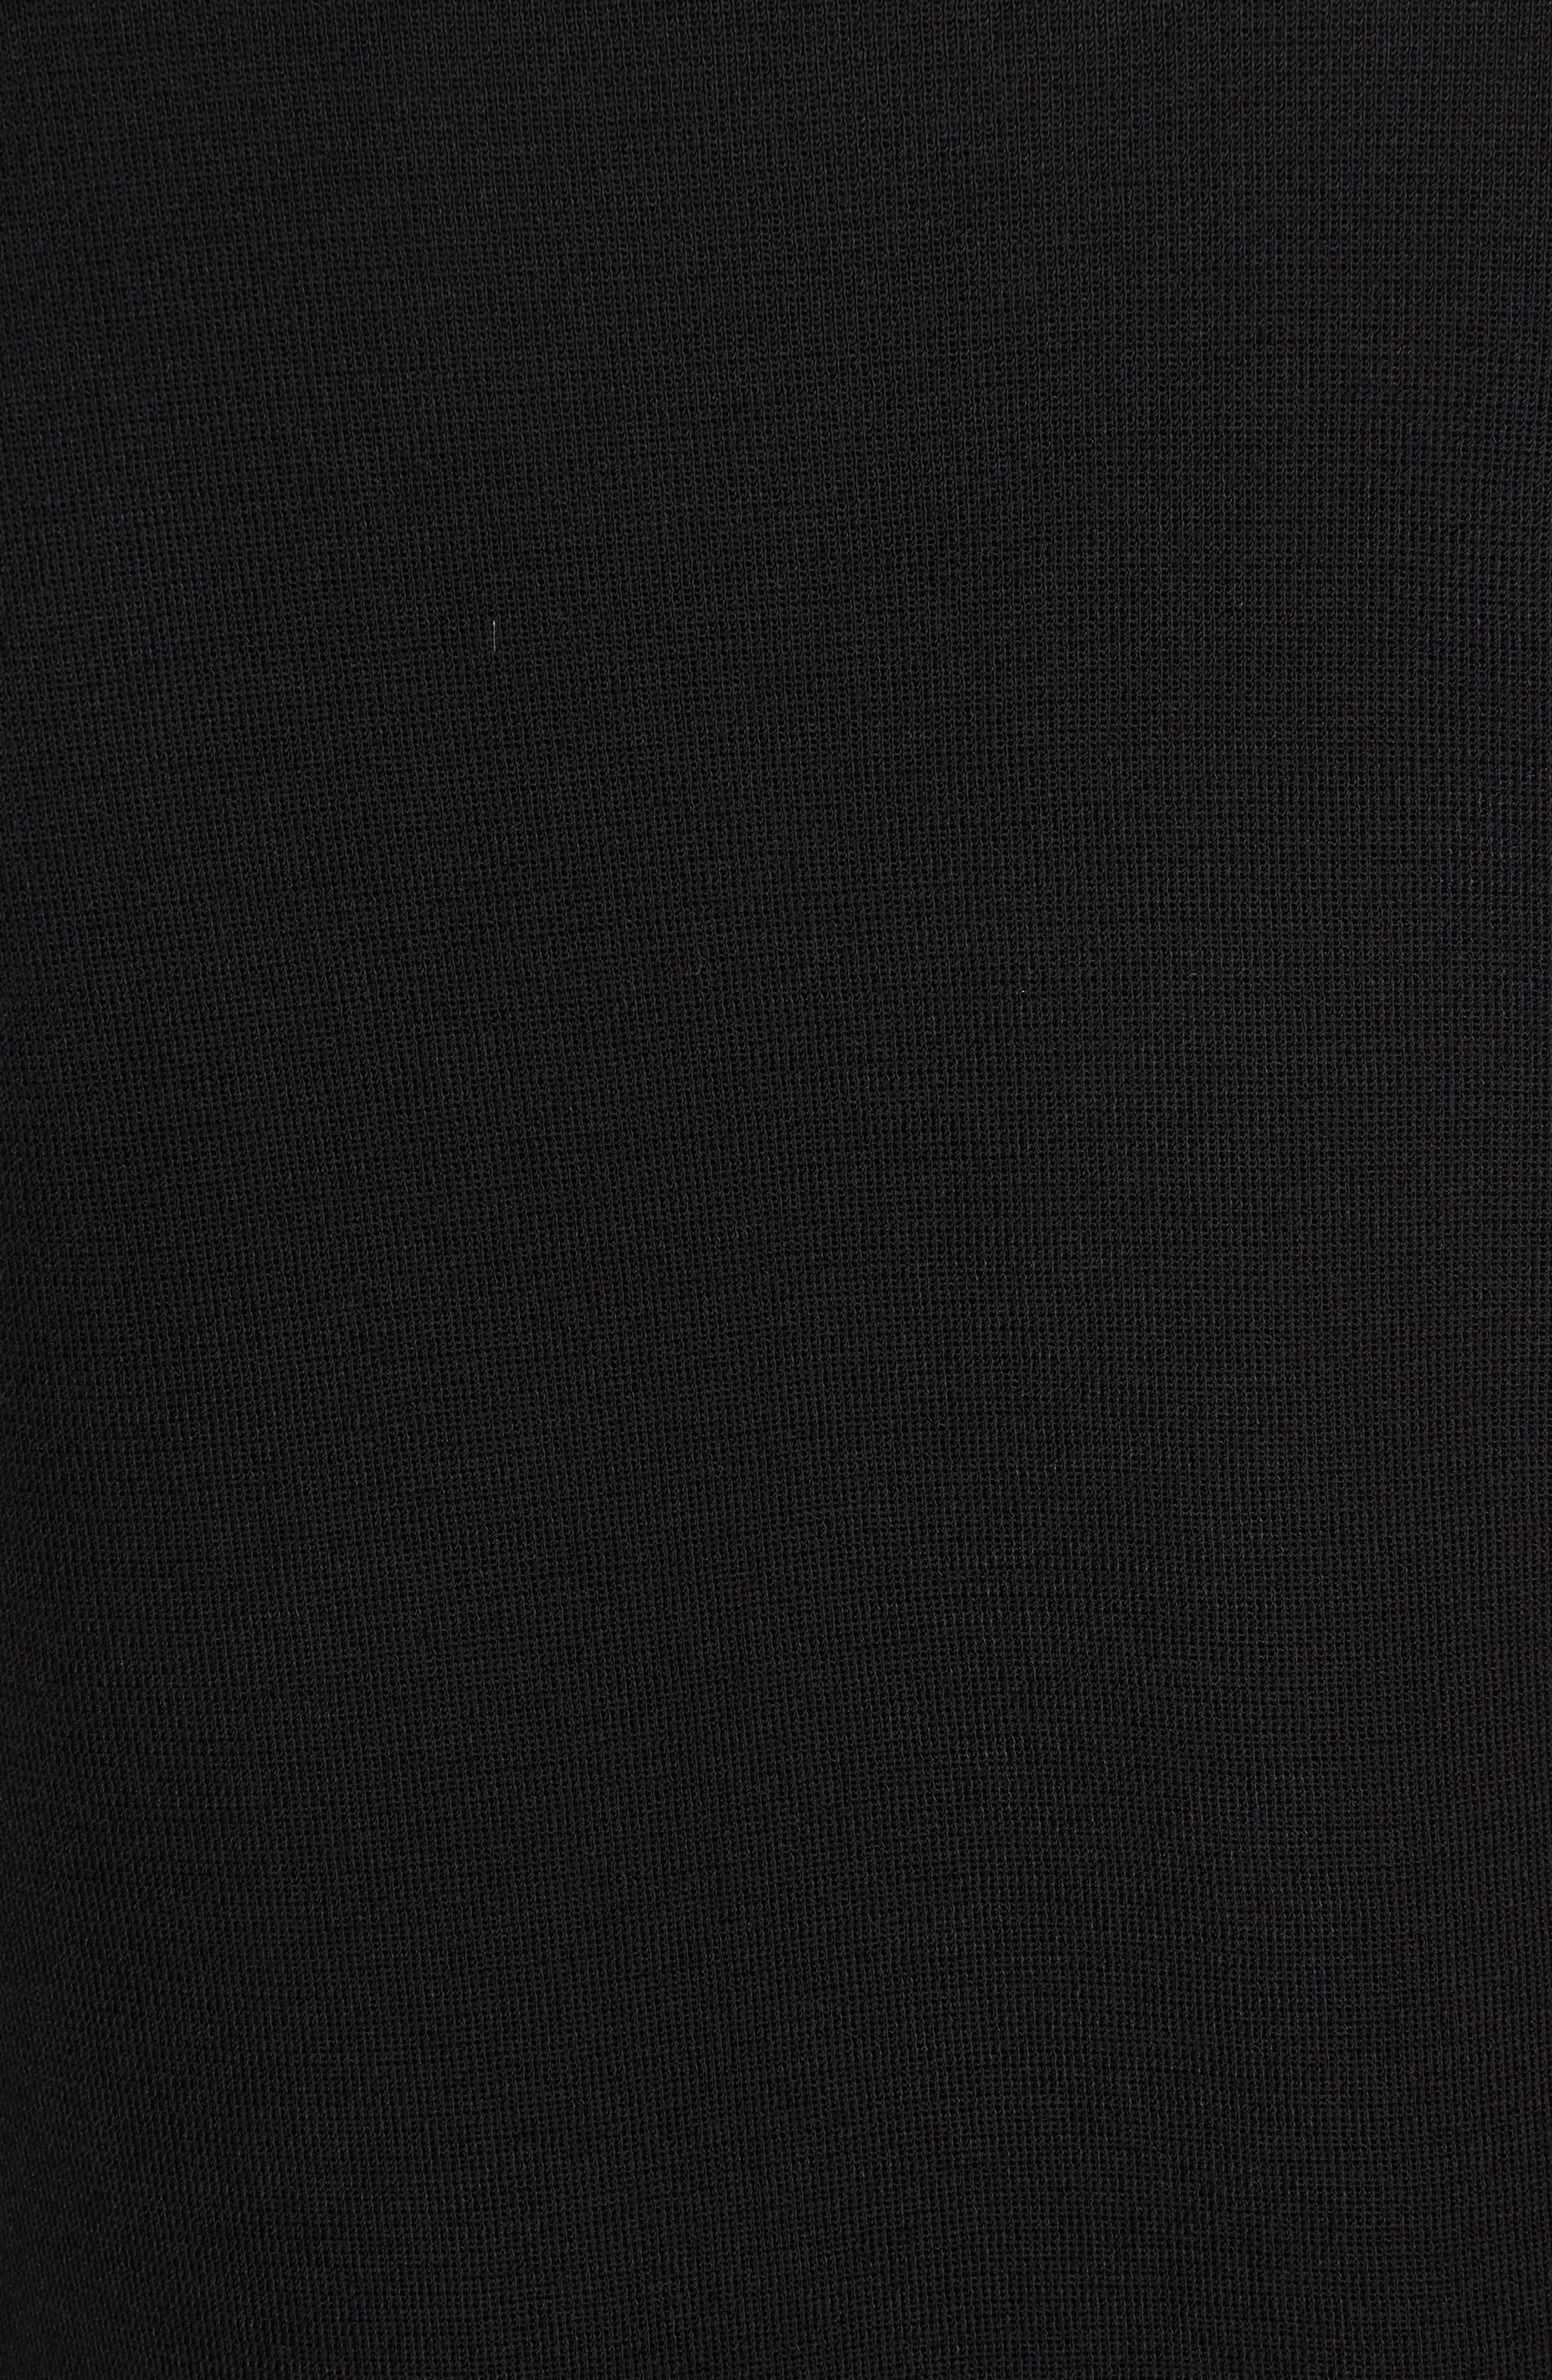 Short Sleeve Dress,                             Alternate thumbnail 6, color,                             BLACK